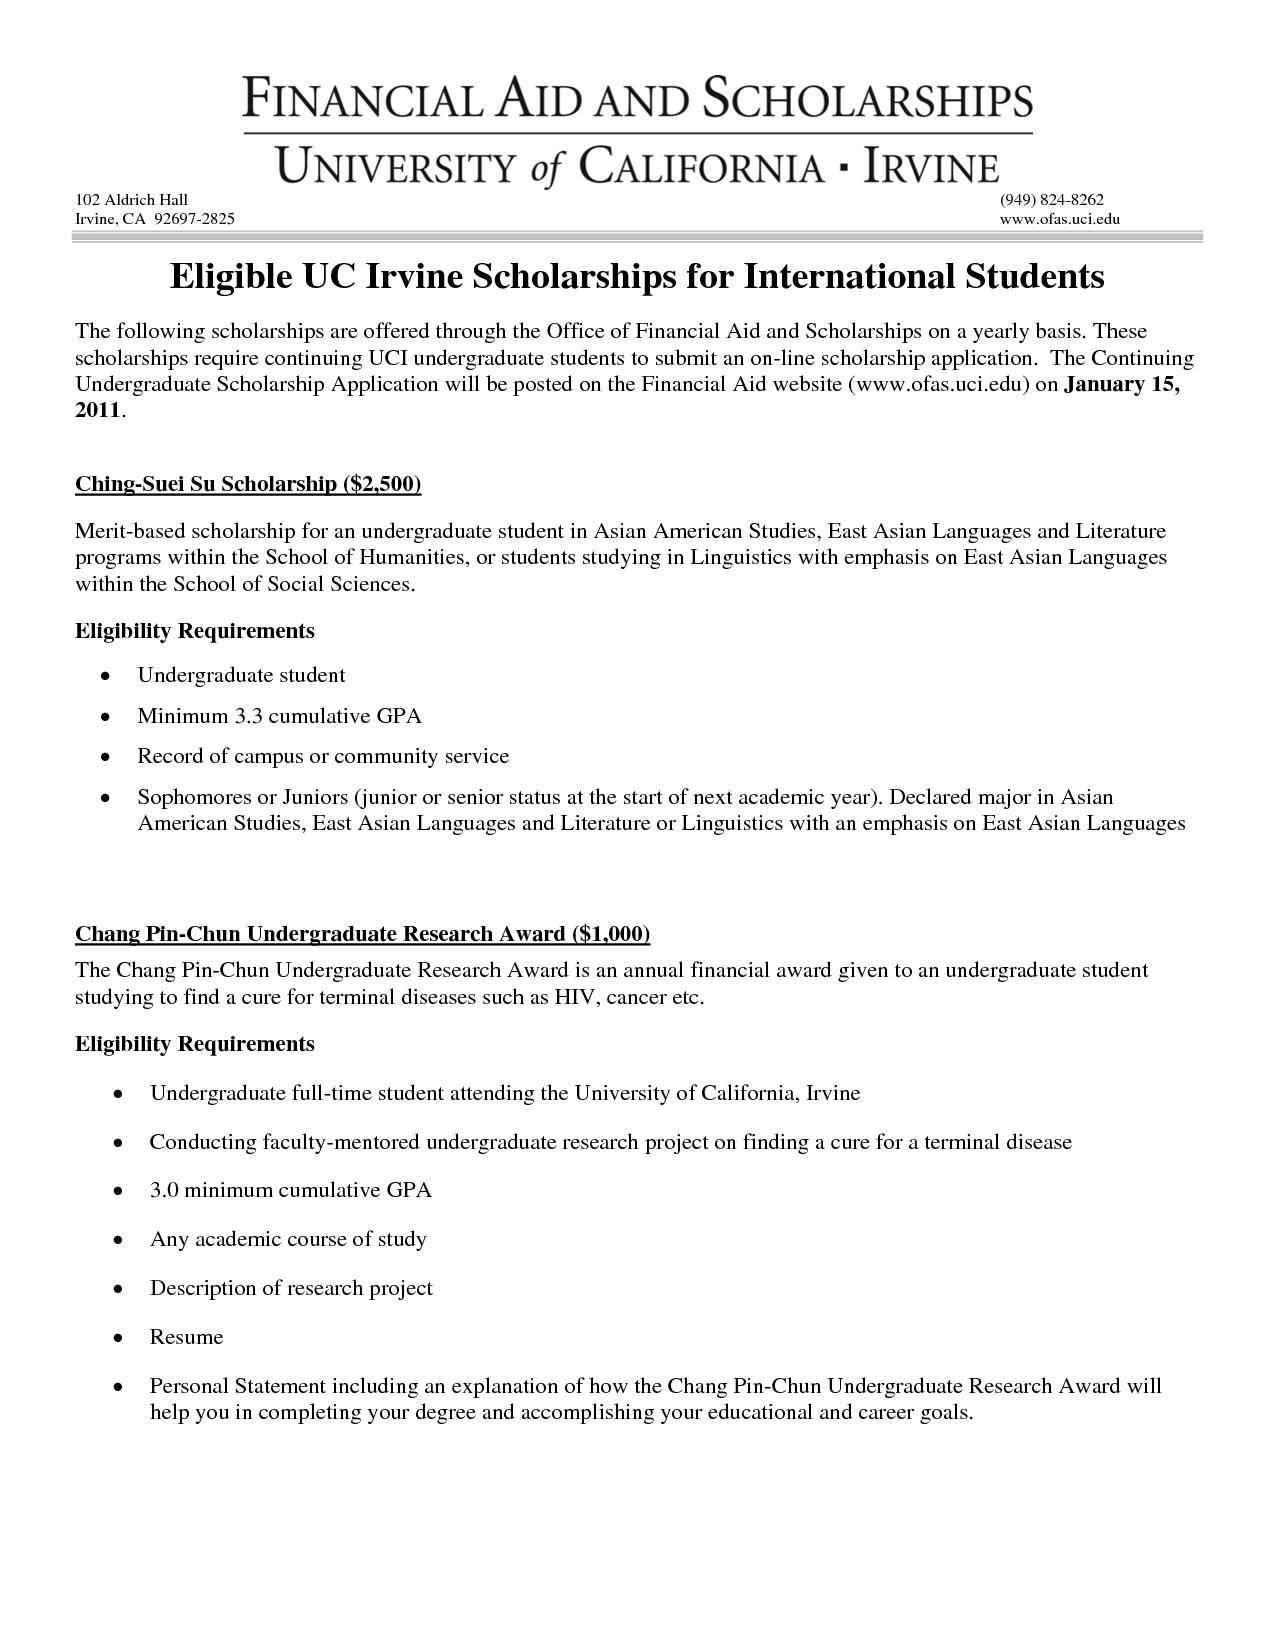 Photo Financial Need Scholarship Essay Examples Images Scholarships Scholarship Essay Examples Cover Letter Sample